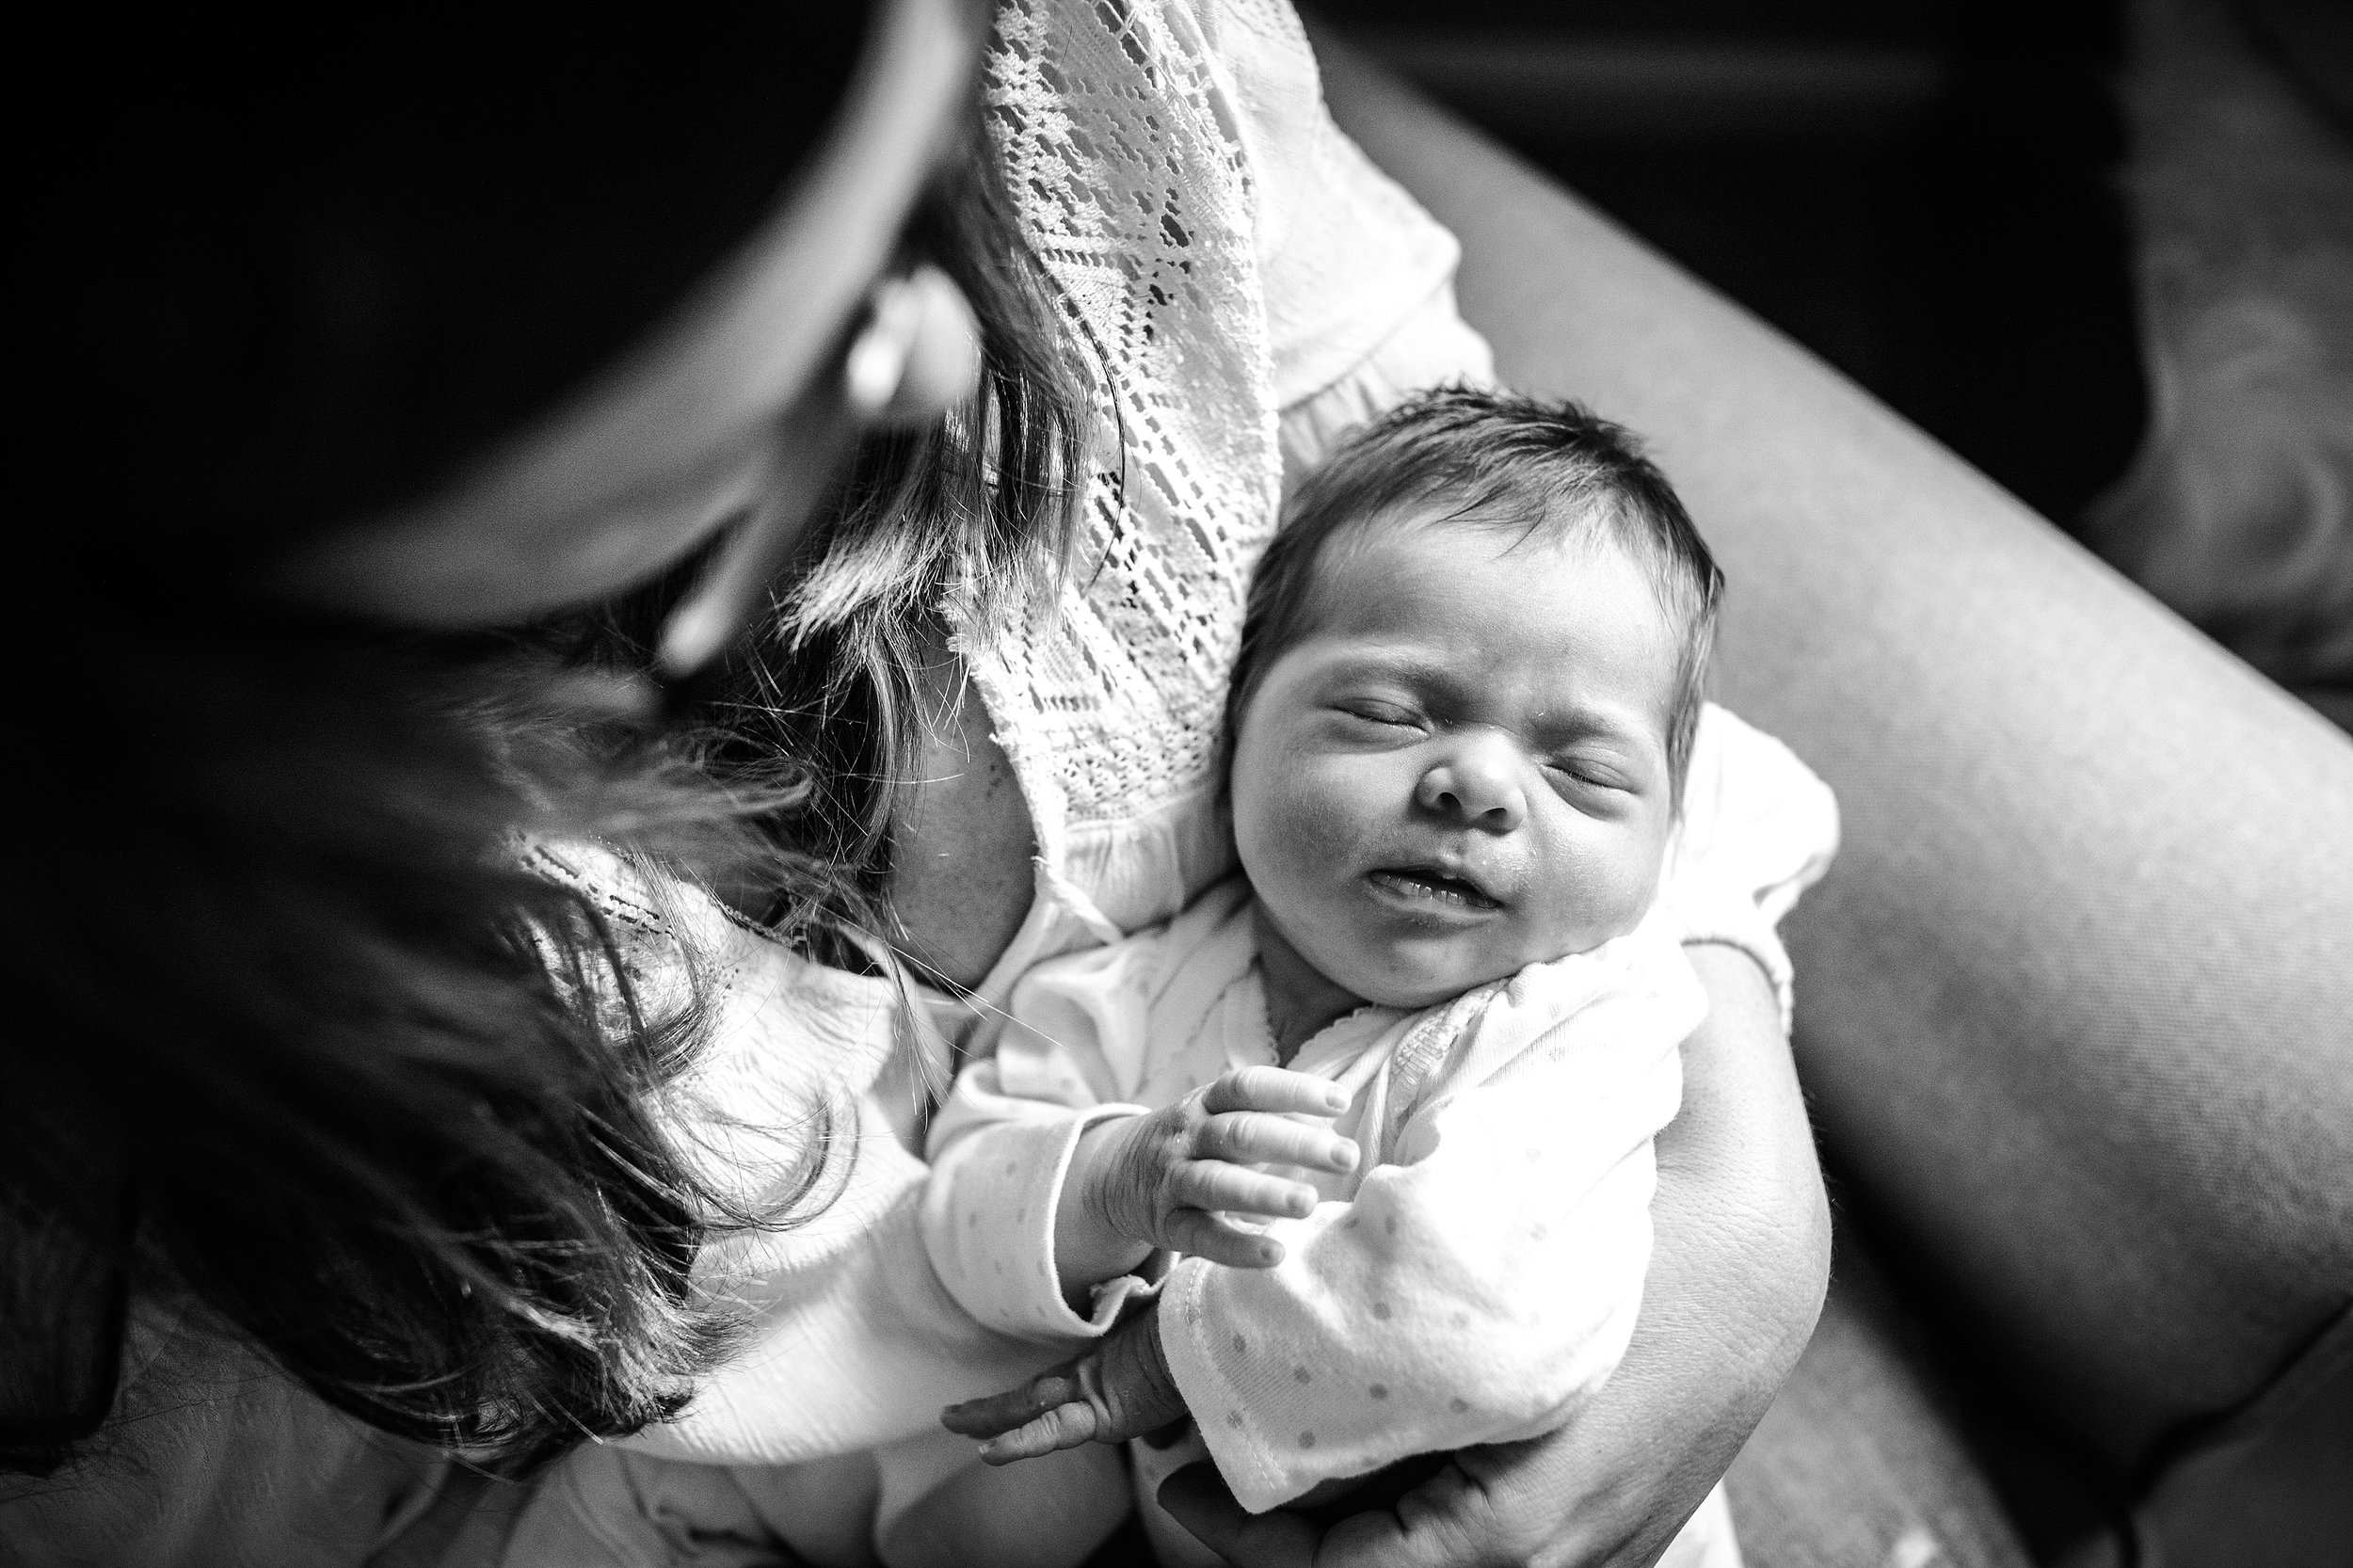 Lehigh-Valley-Newborn-Photographer_0006.jpg